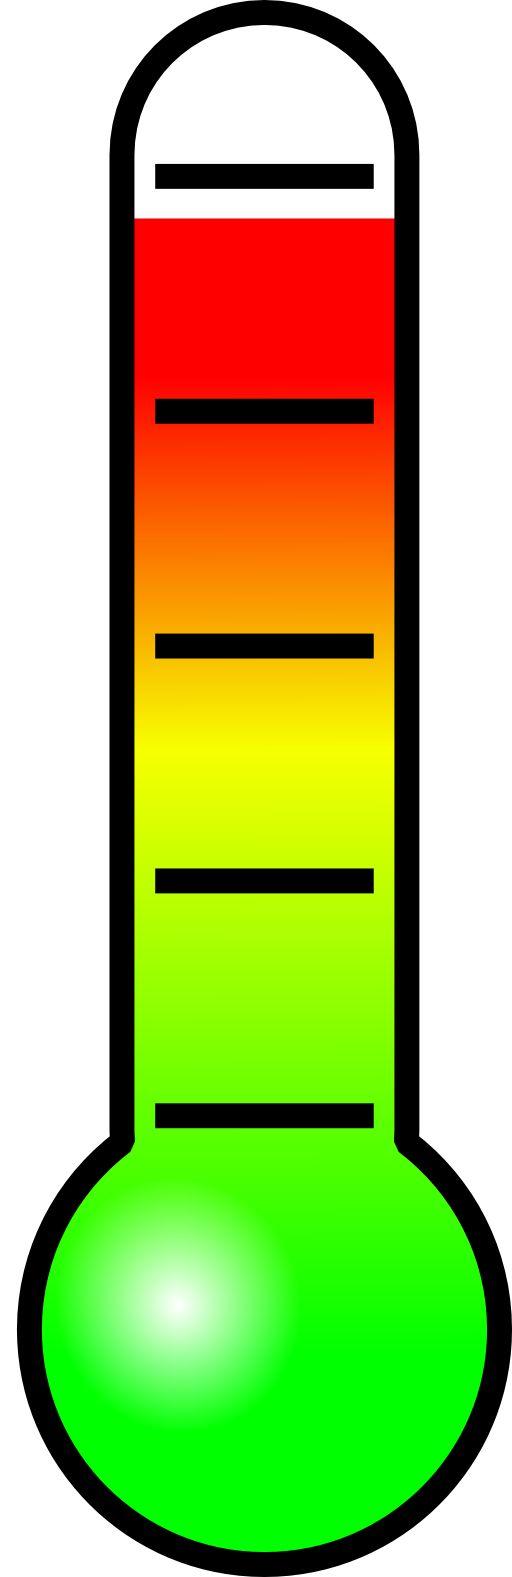 stress thermometer nederland - Google zoeken